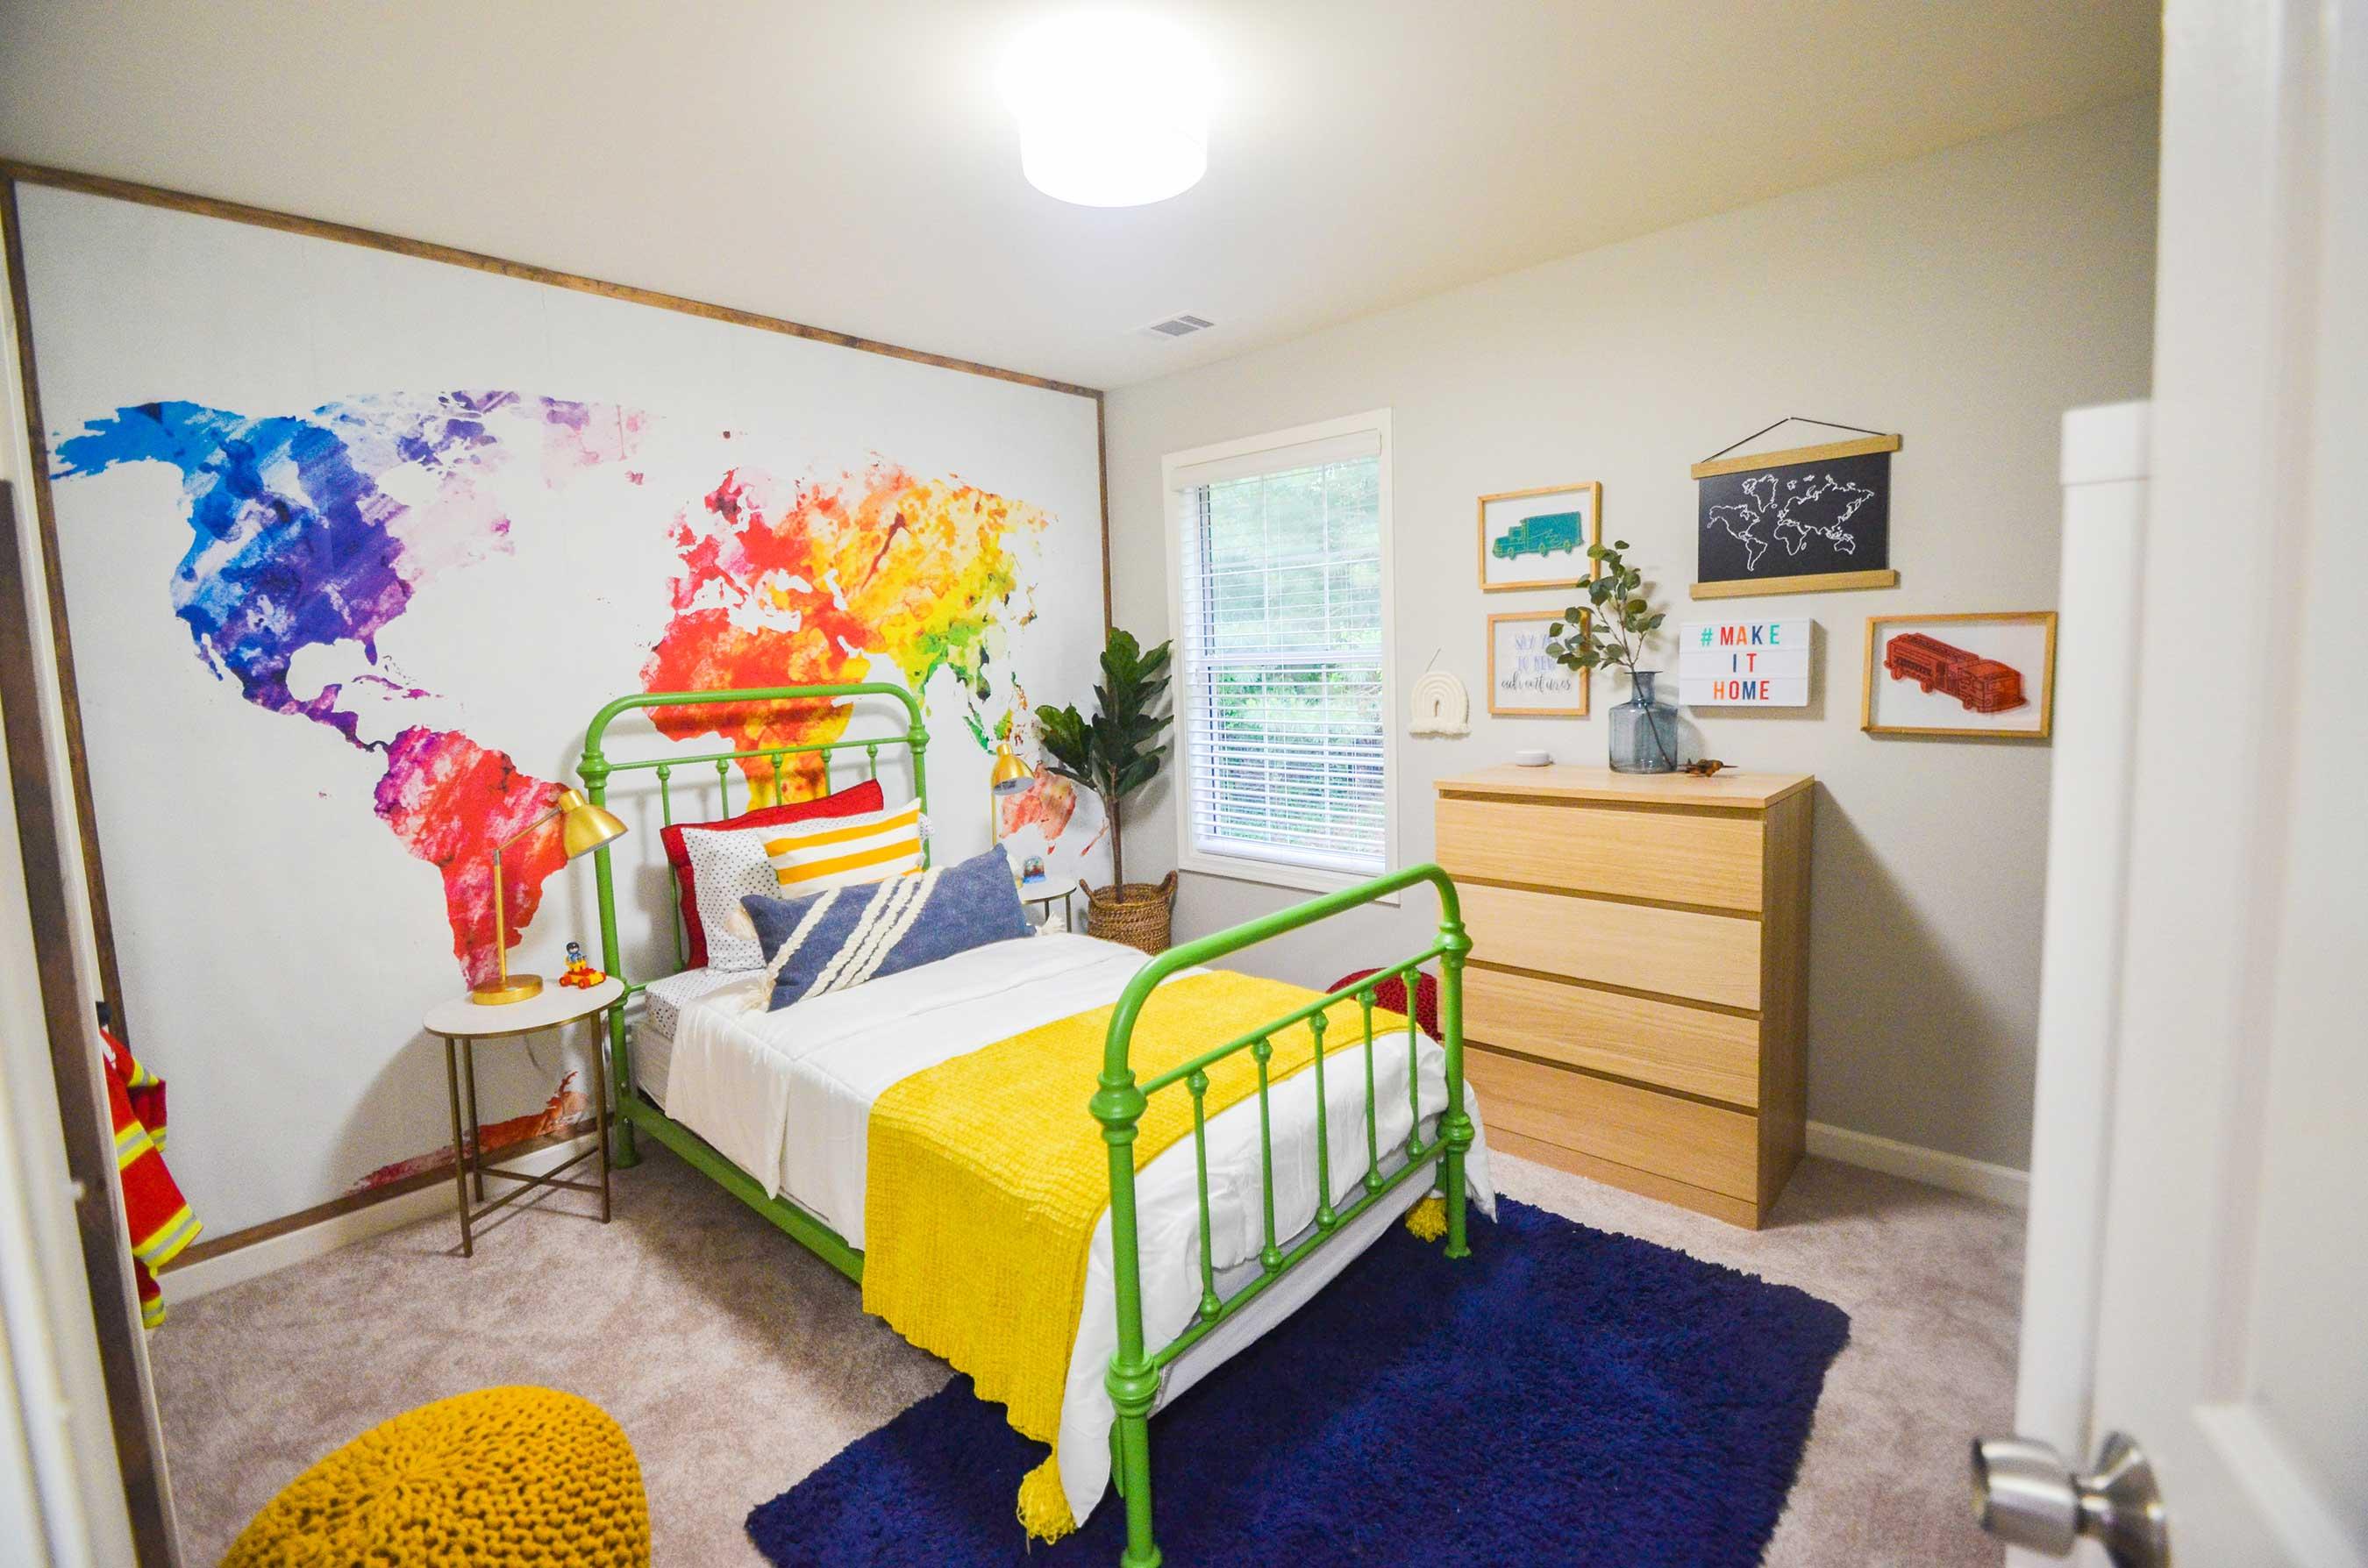 Make it Home Children's Room